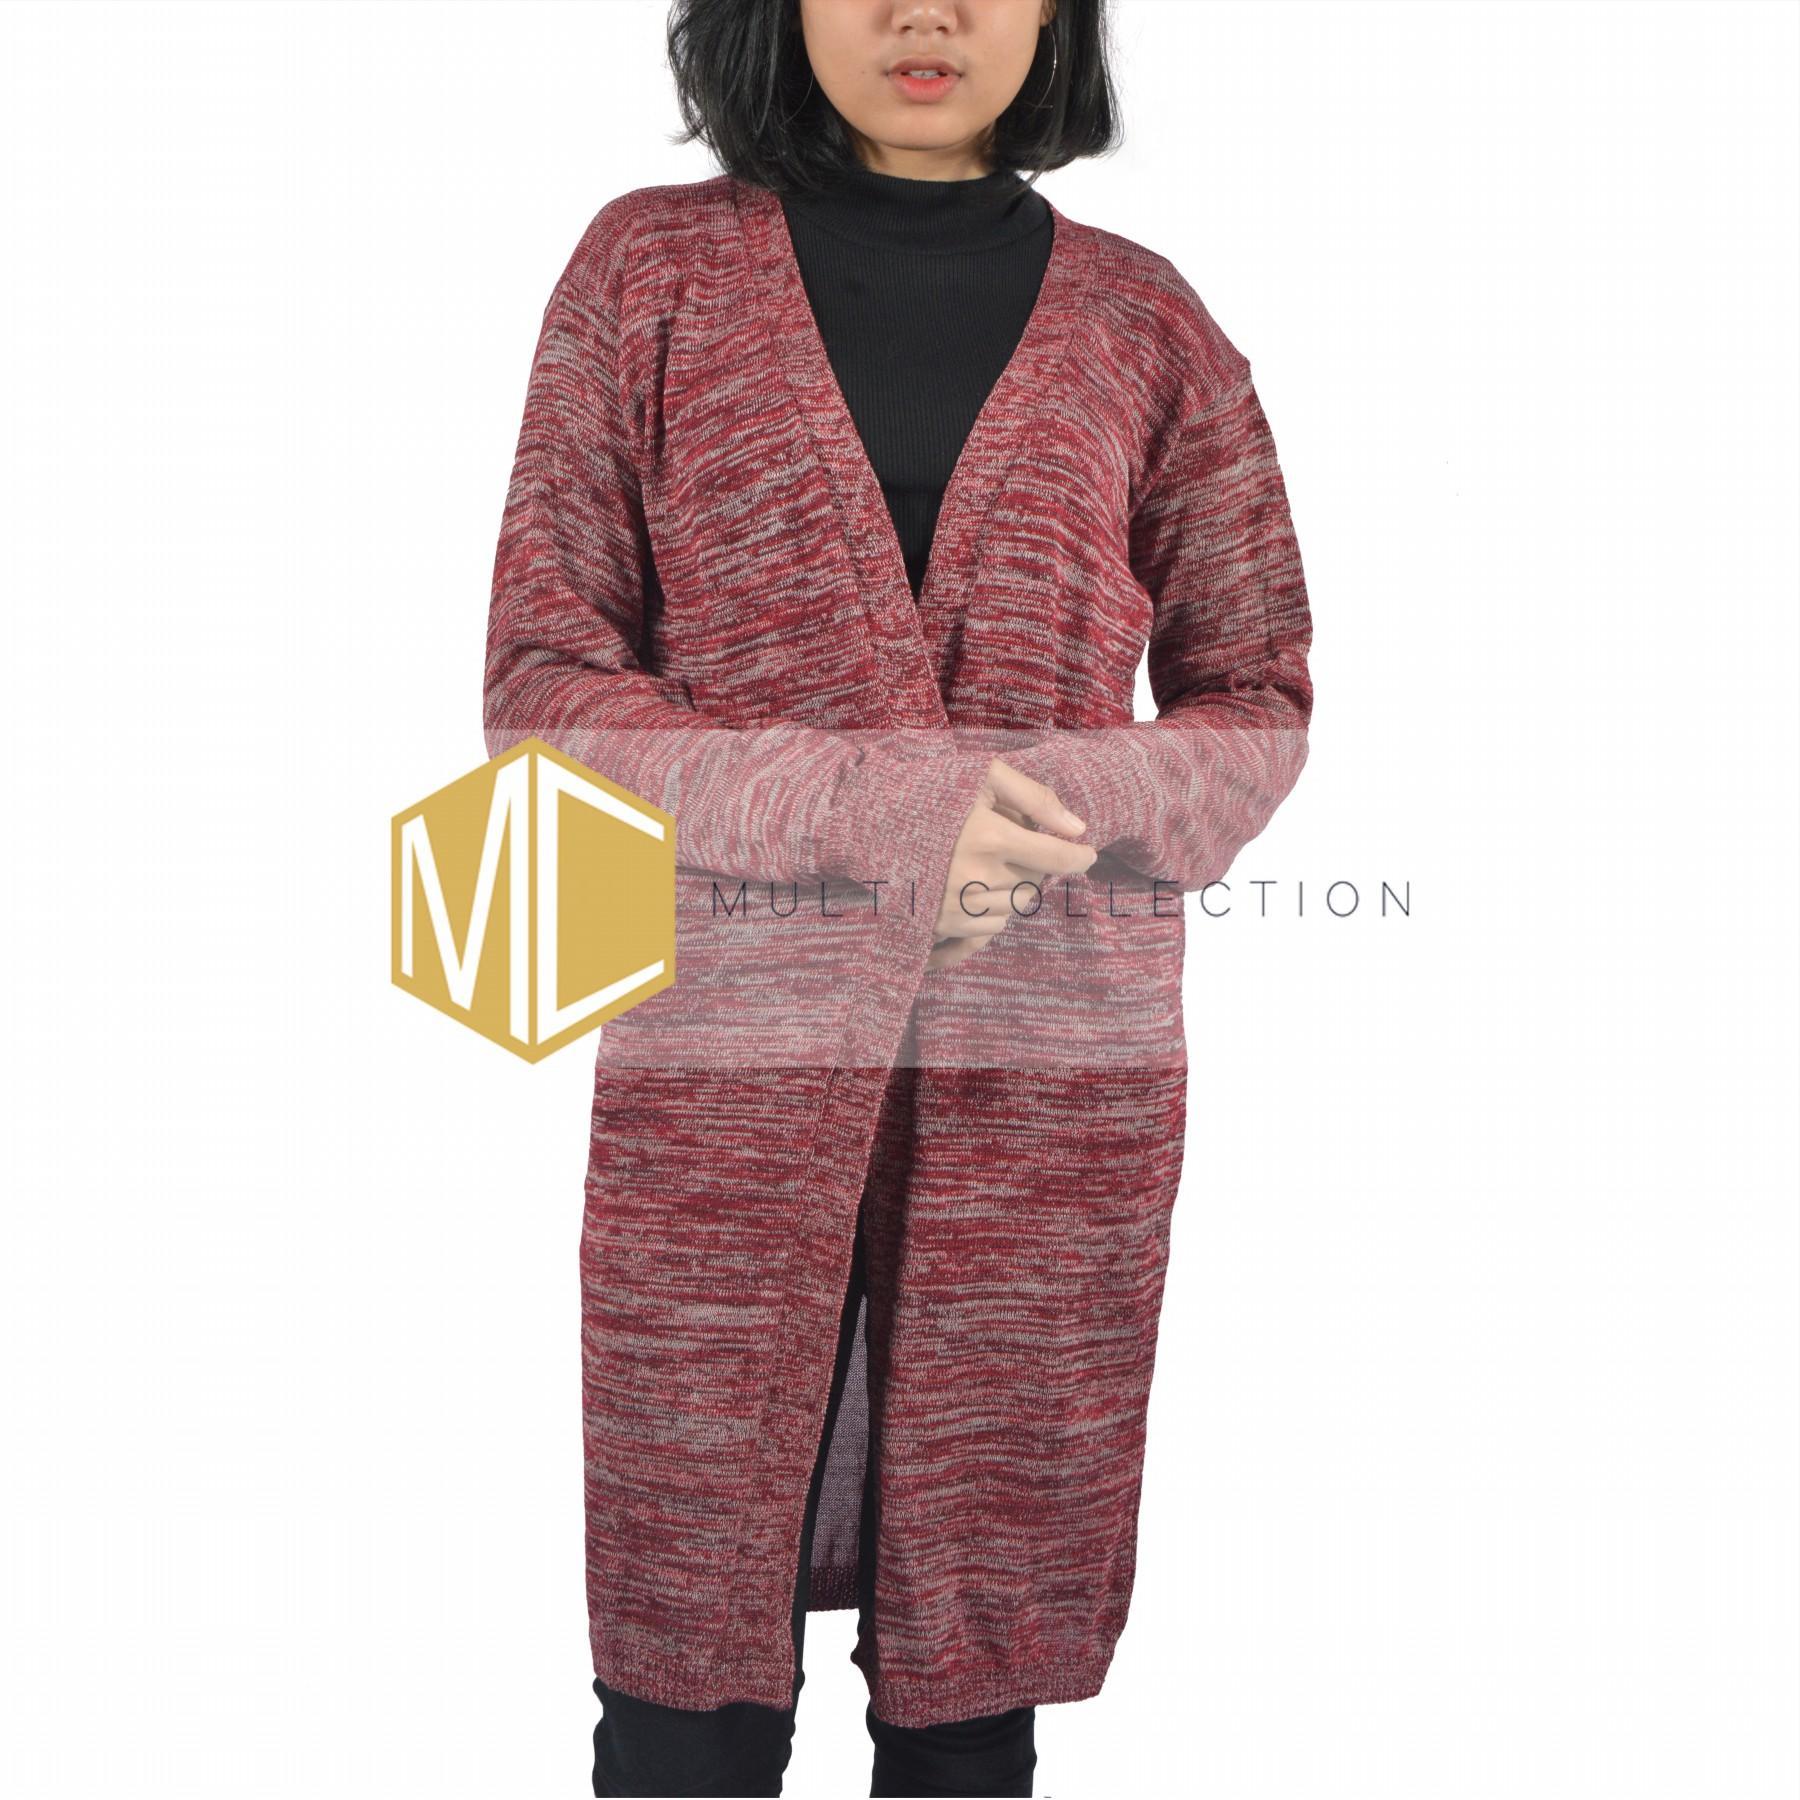 Baju Atasan Wanita LONG TWIST CARDY baju rajut kardigan long cardy fashion muslim fashion wanita outerwear